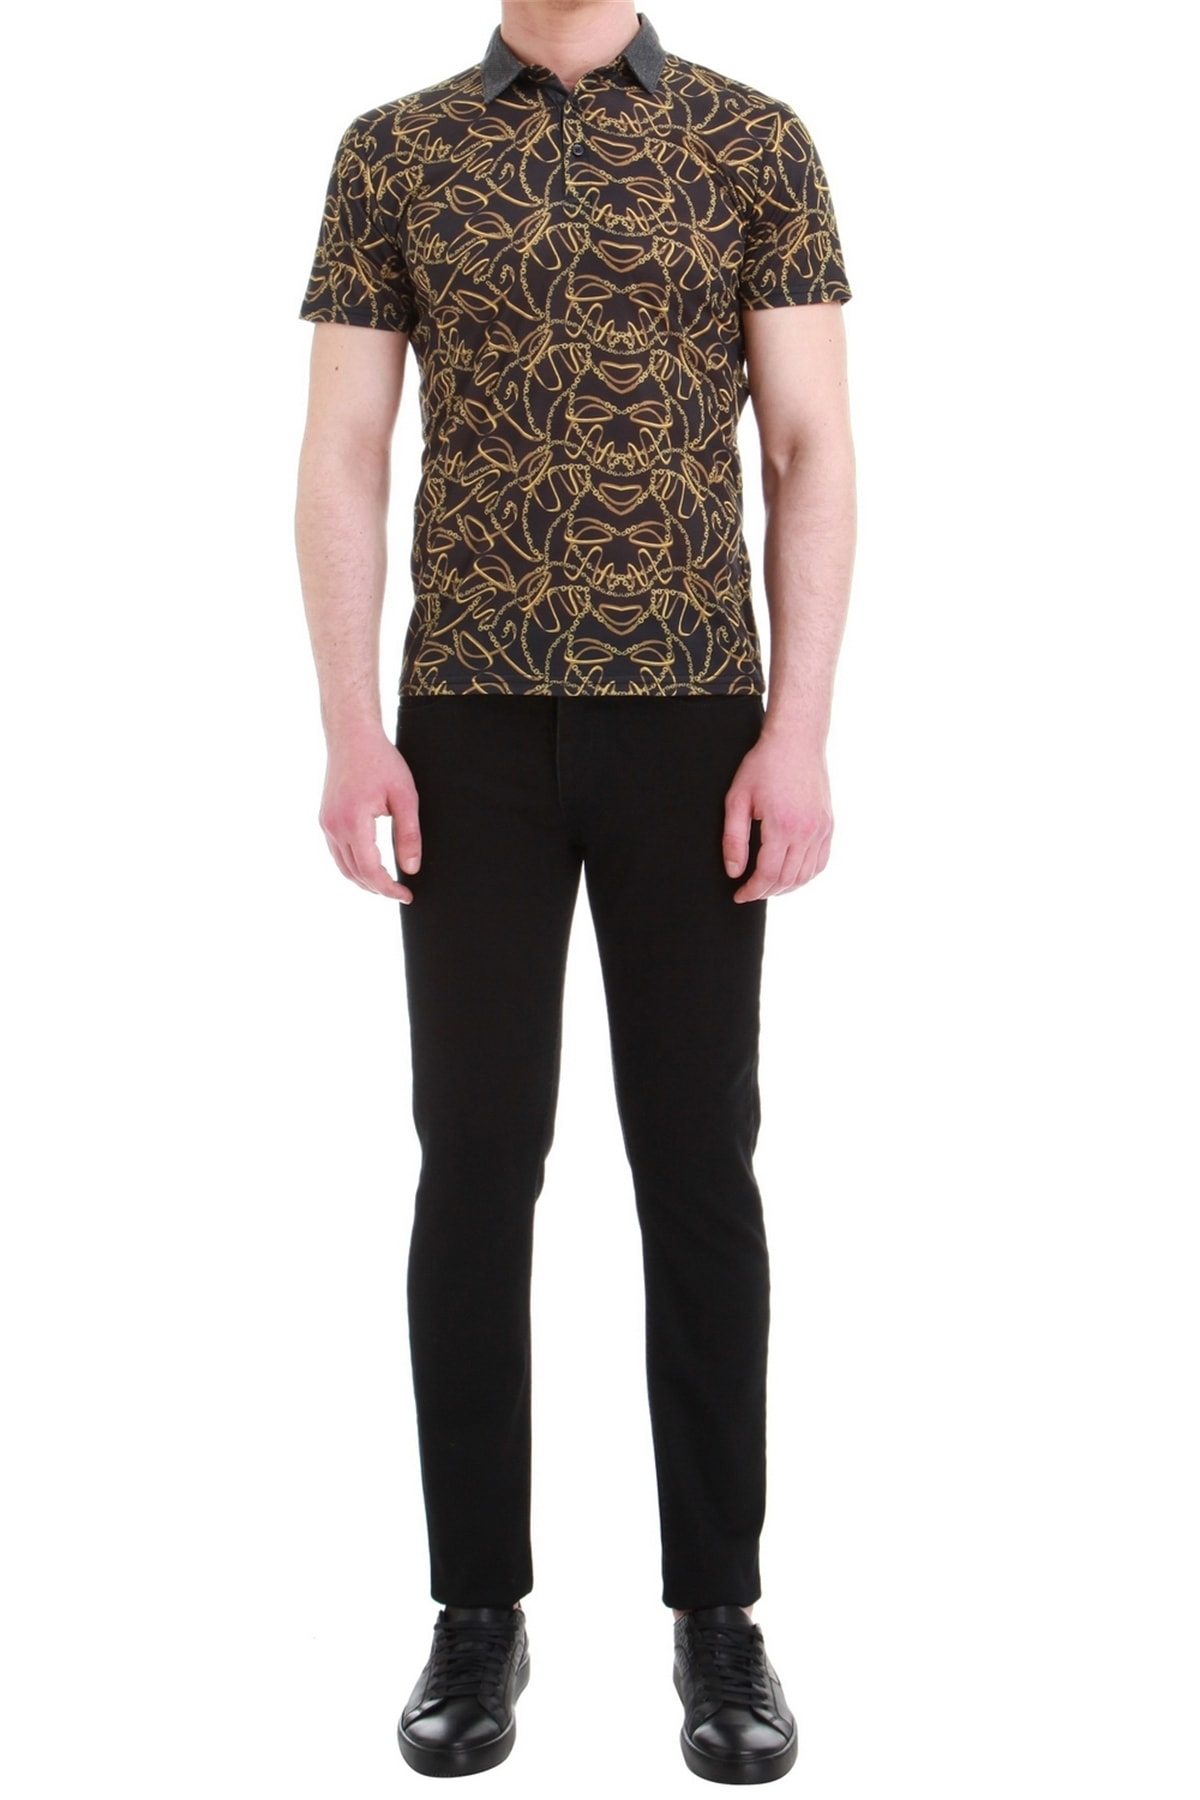 Efor Erkek Siyah Slim Fit Jean Pantolon 034 1